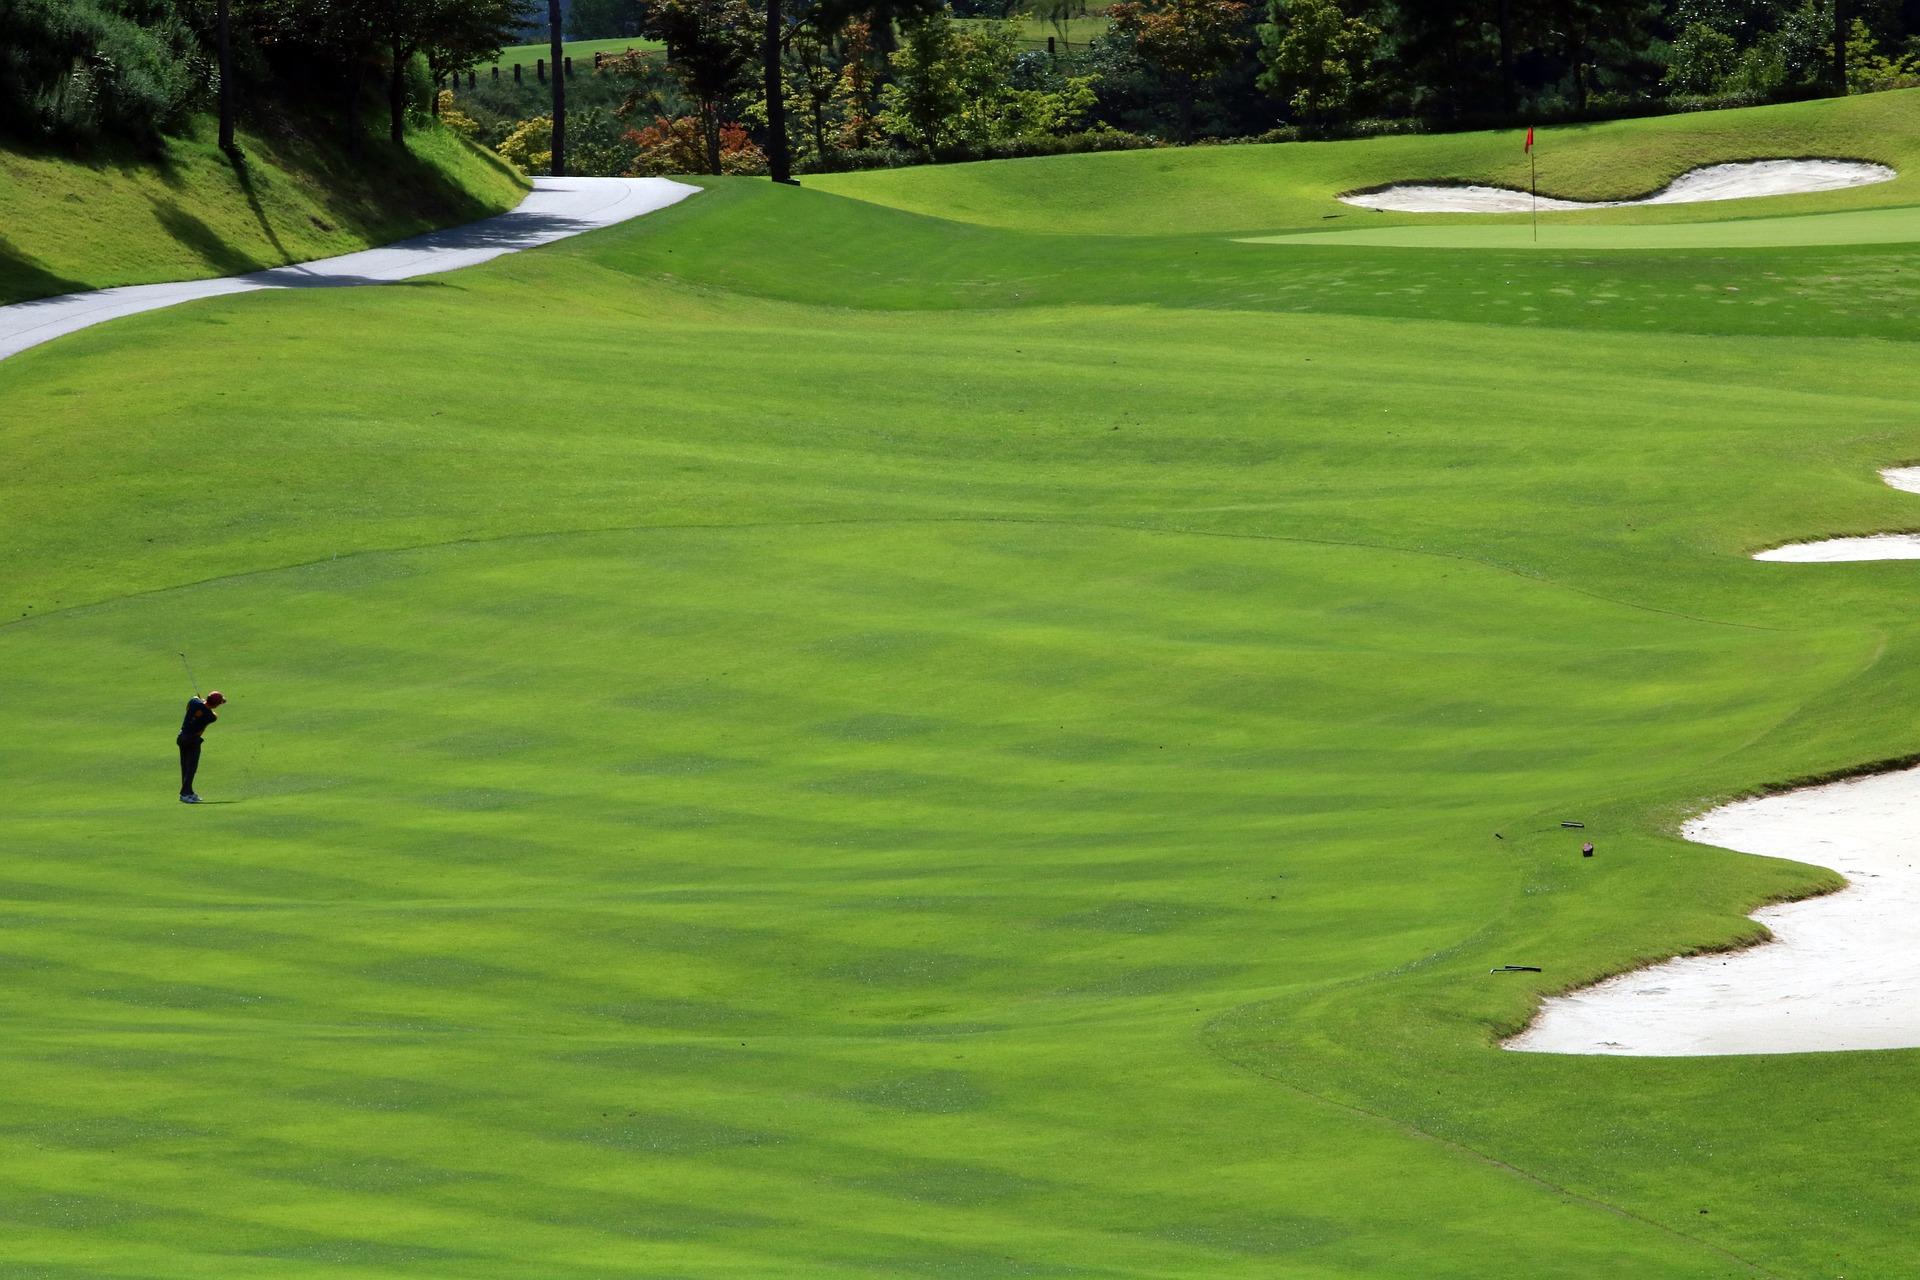 Golf Entfernungsmesser: Laser oder GPS Uhr?